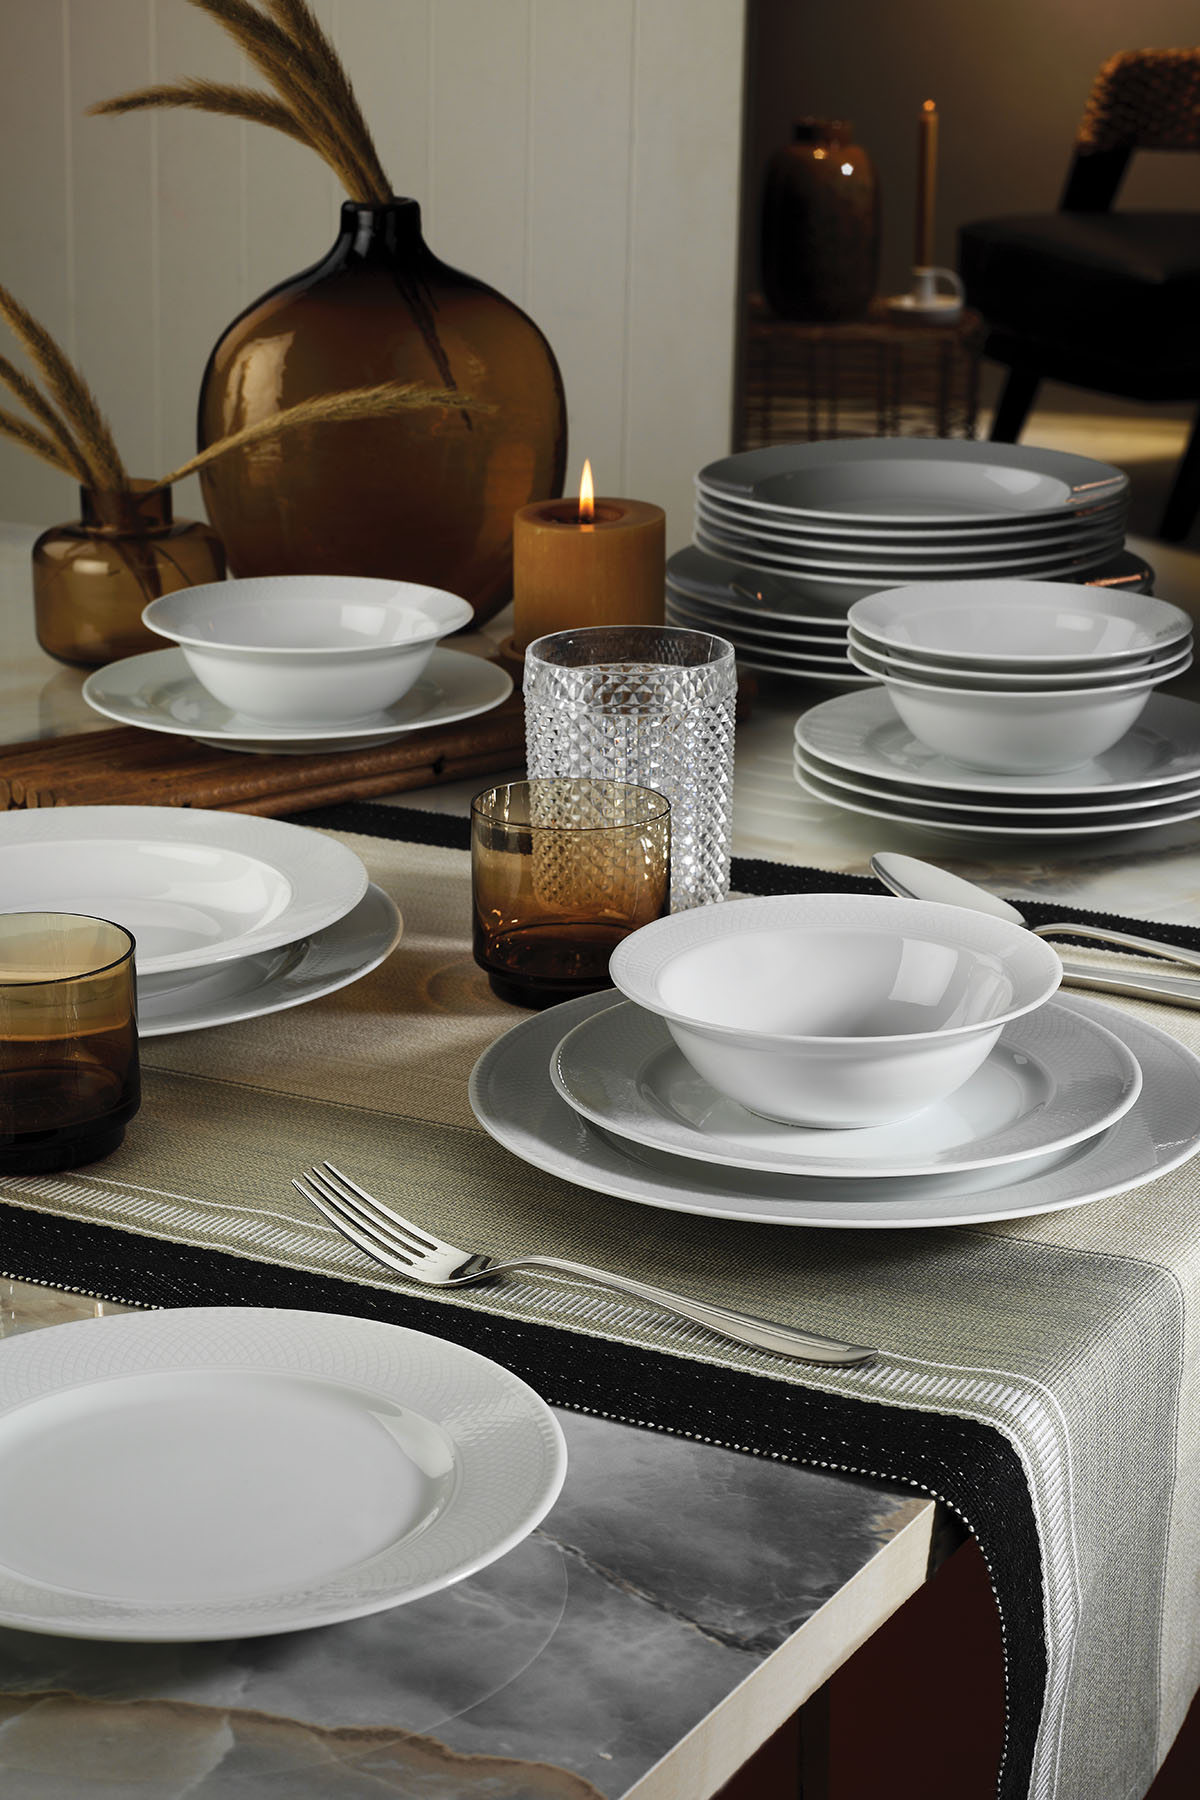 Kütahya Porselen - Kütahya Porselen Zümrüt 24 Parça Yemek Seti